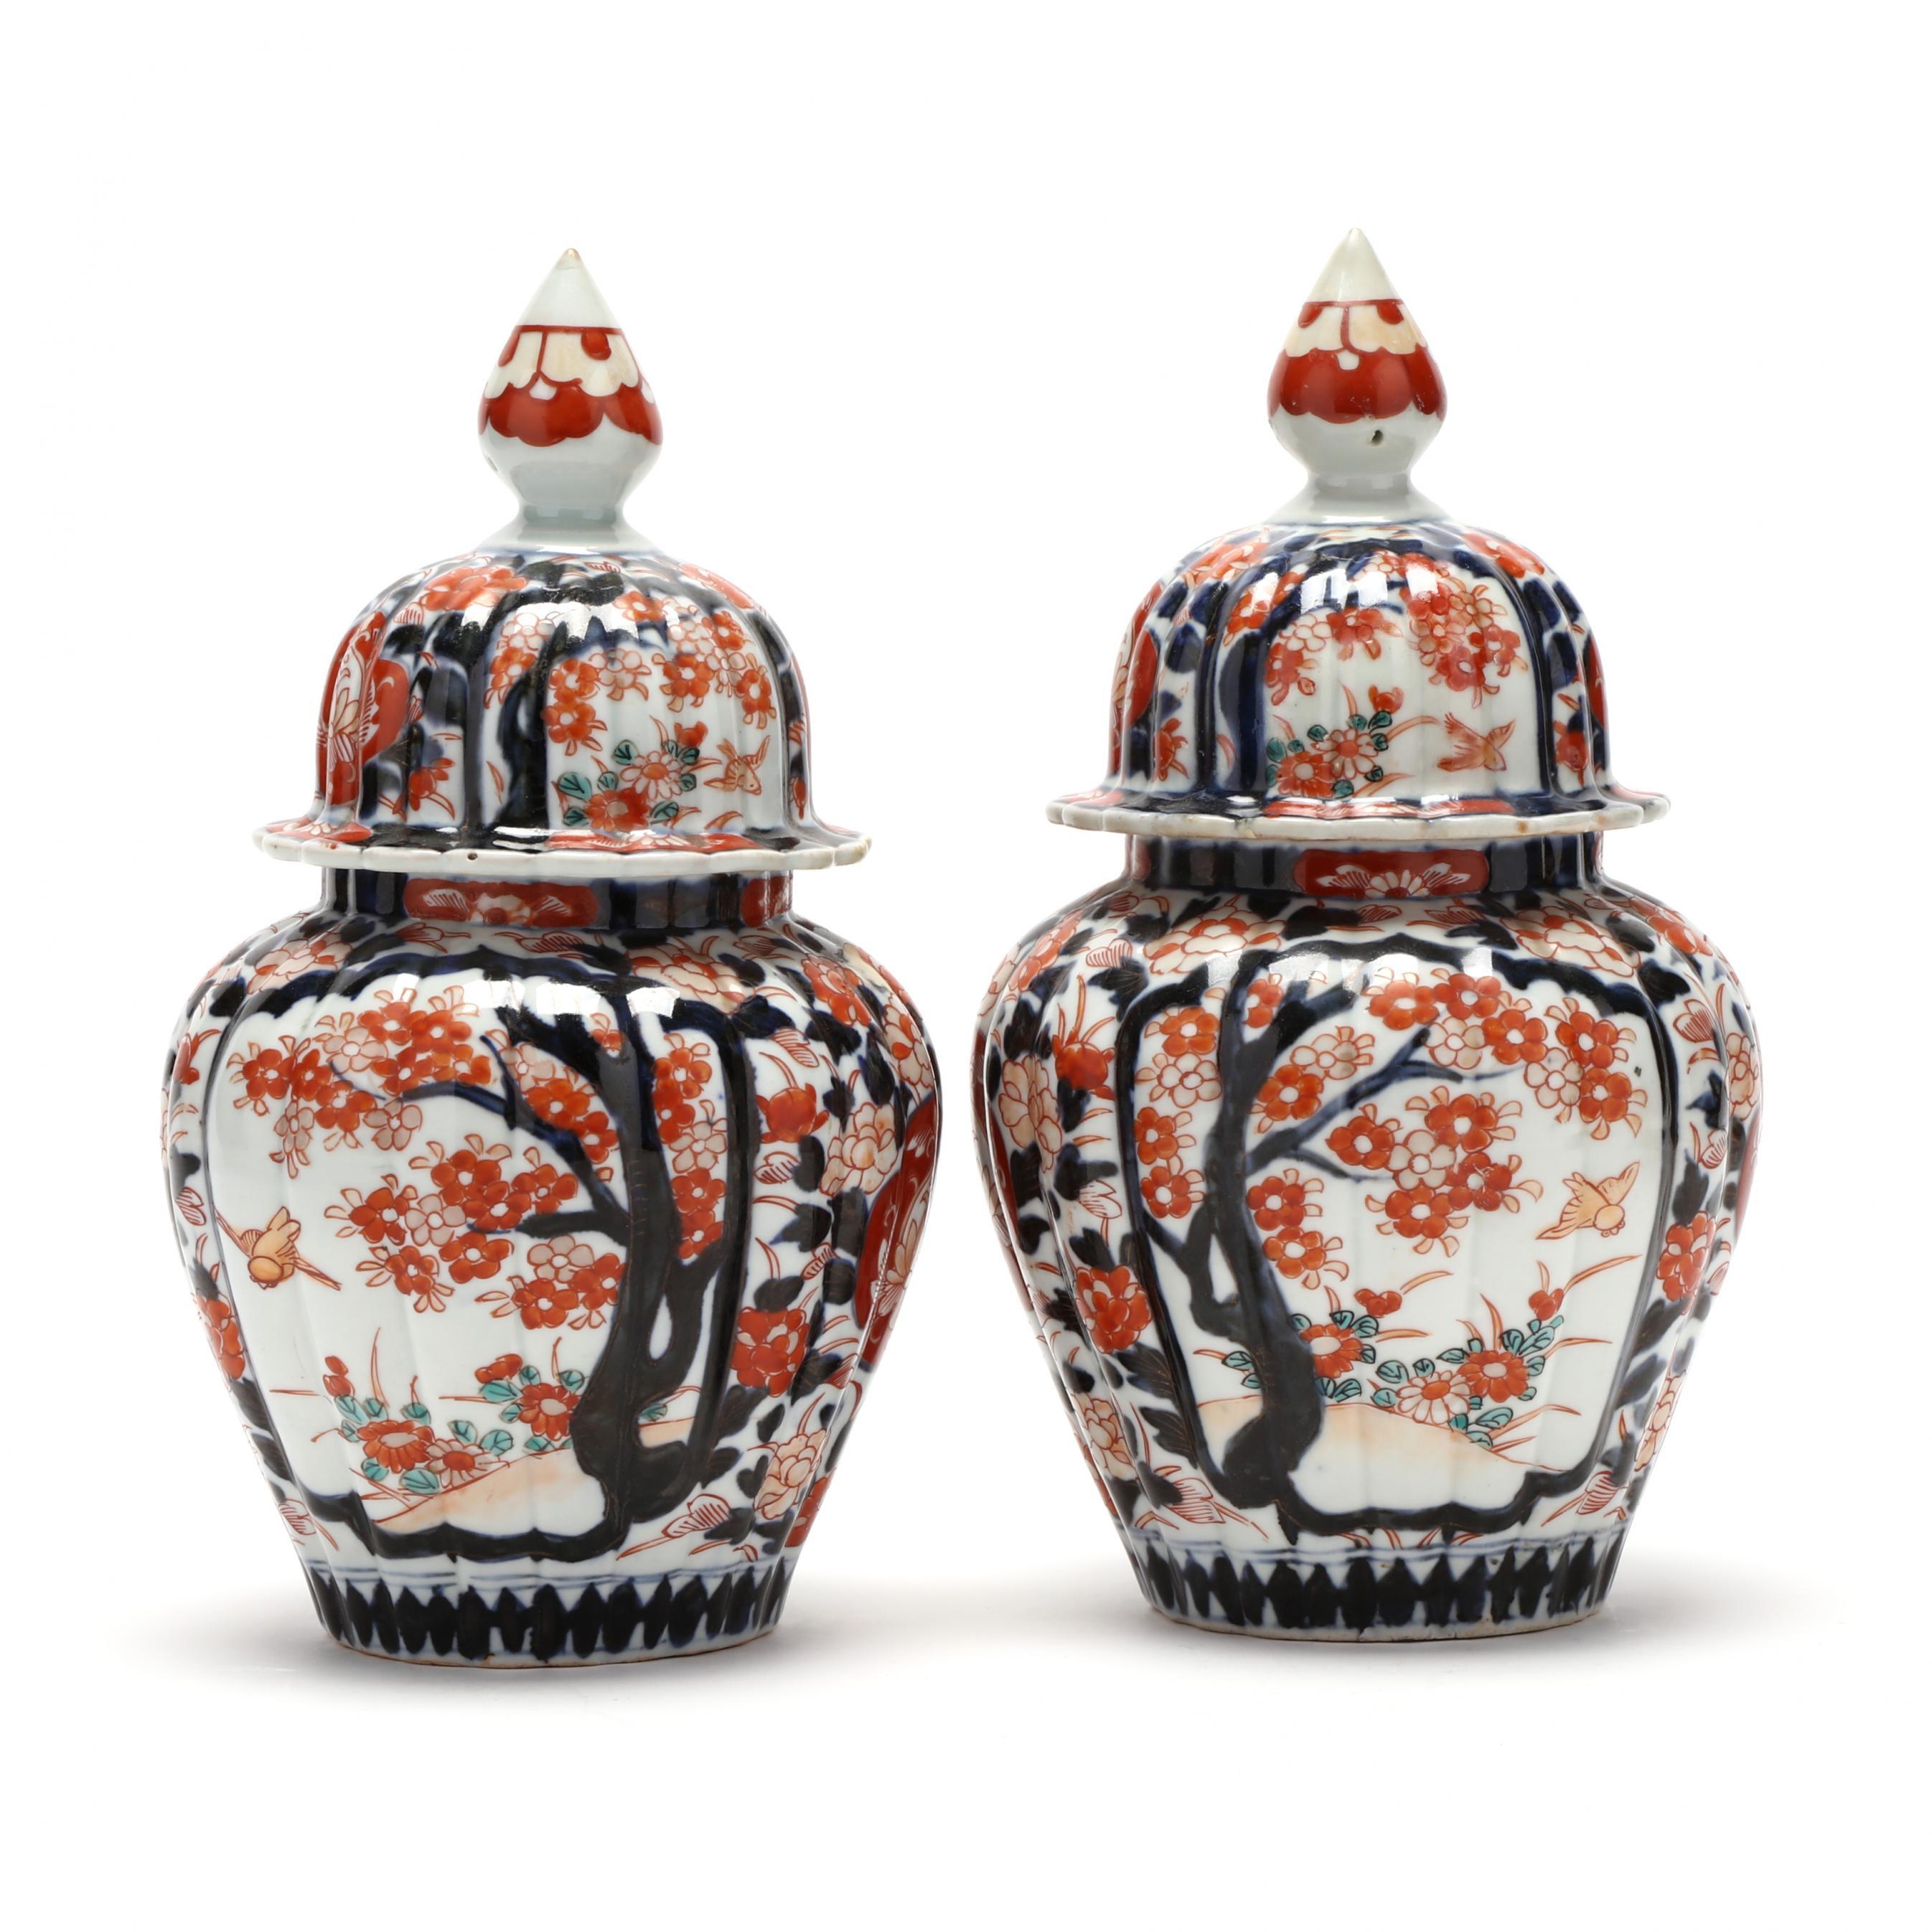 pair-of-chinese-imari-porcelain-lidded-ginger-jars